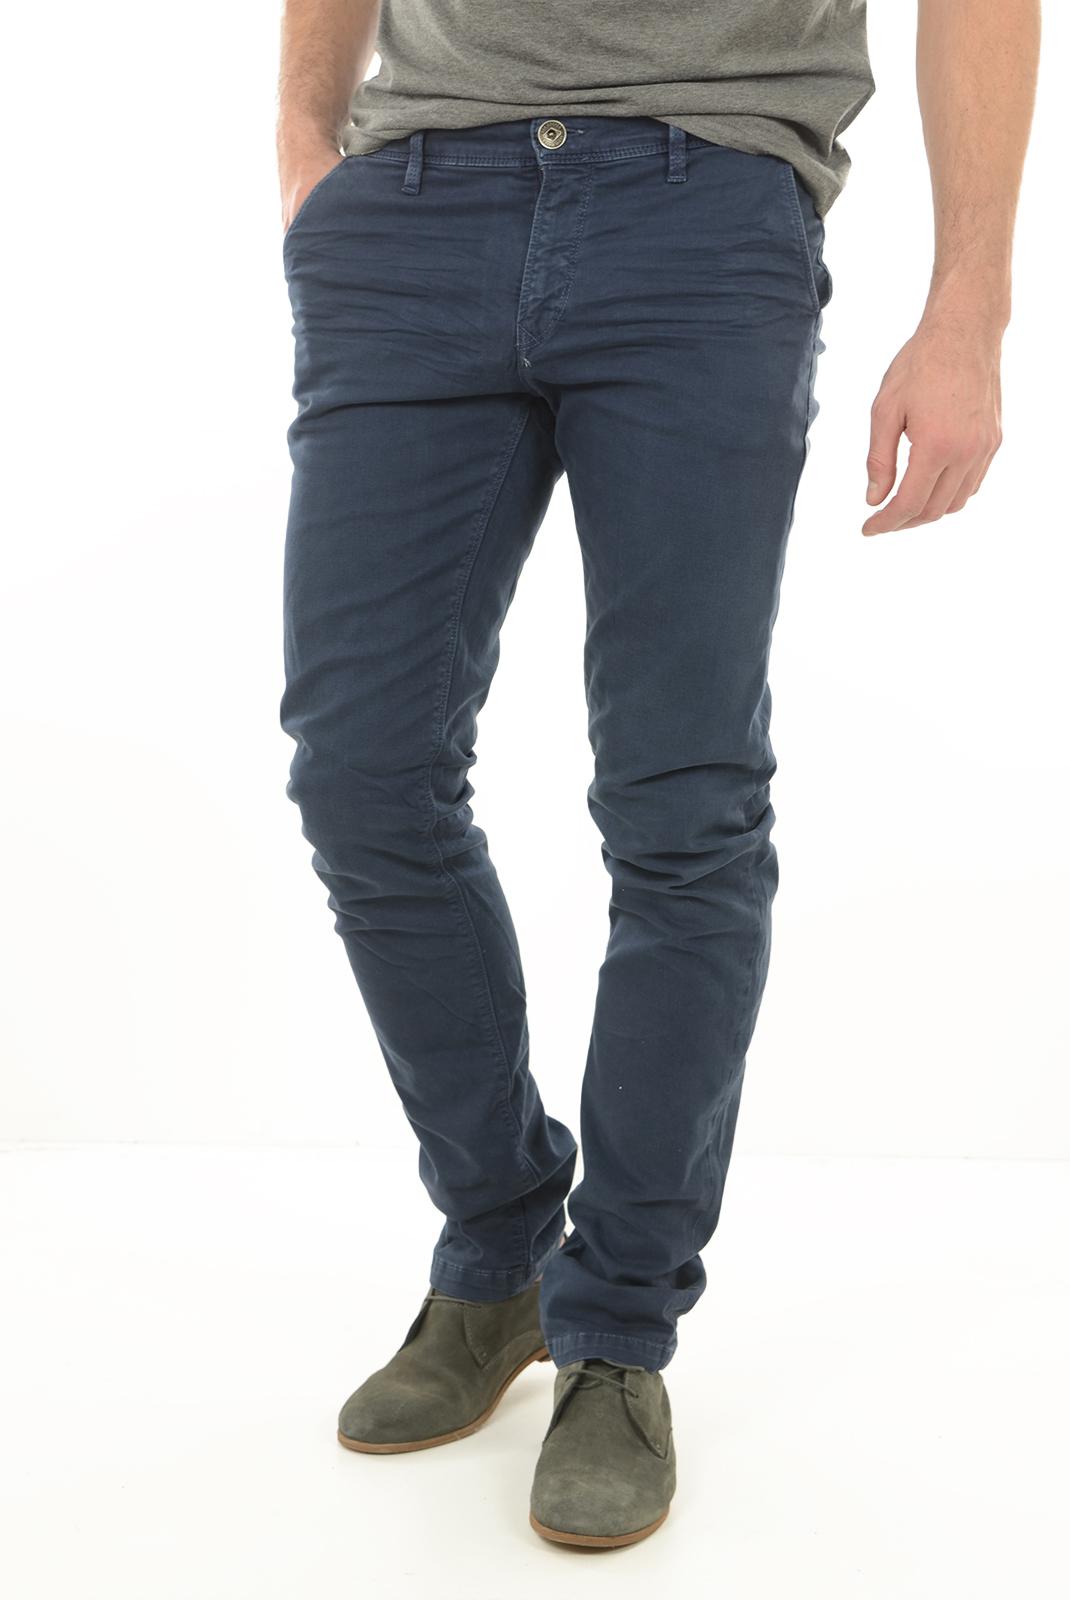 Homme Lee Jeans Pantalon Svpumz Chino Bleu Cooper 5jRL43A